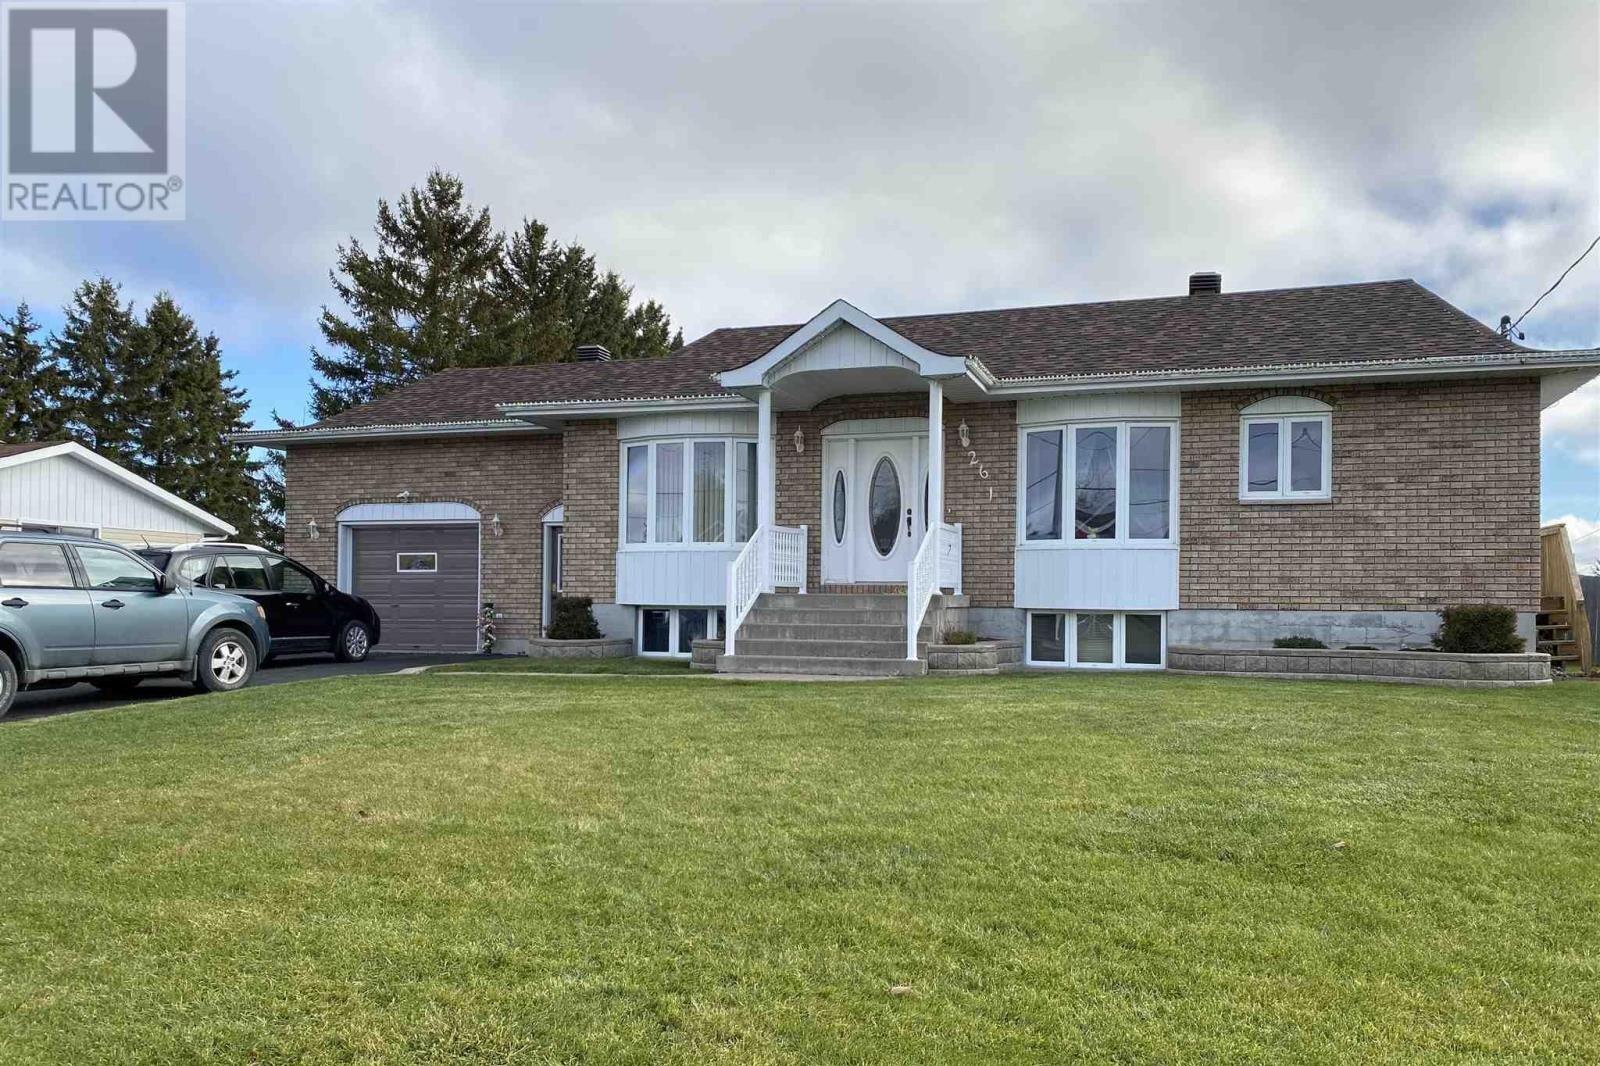 House for sale at 261 Laurette St Temiskaming Shores Ontario - MLS: TM202180